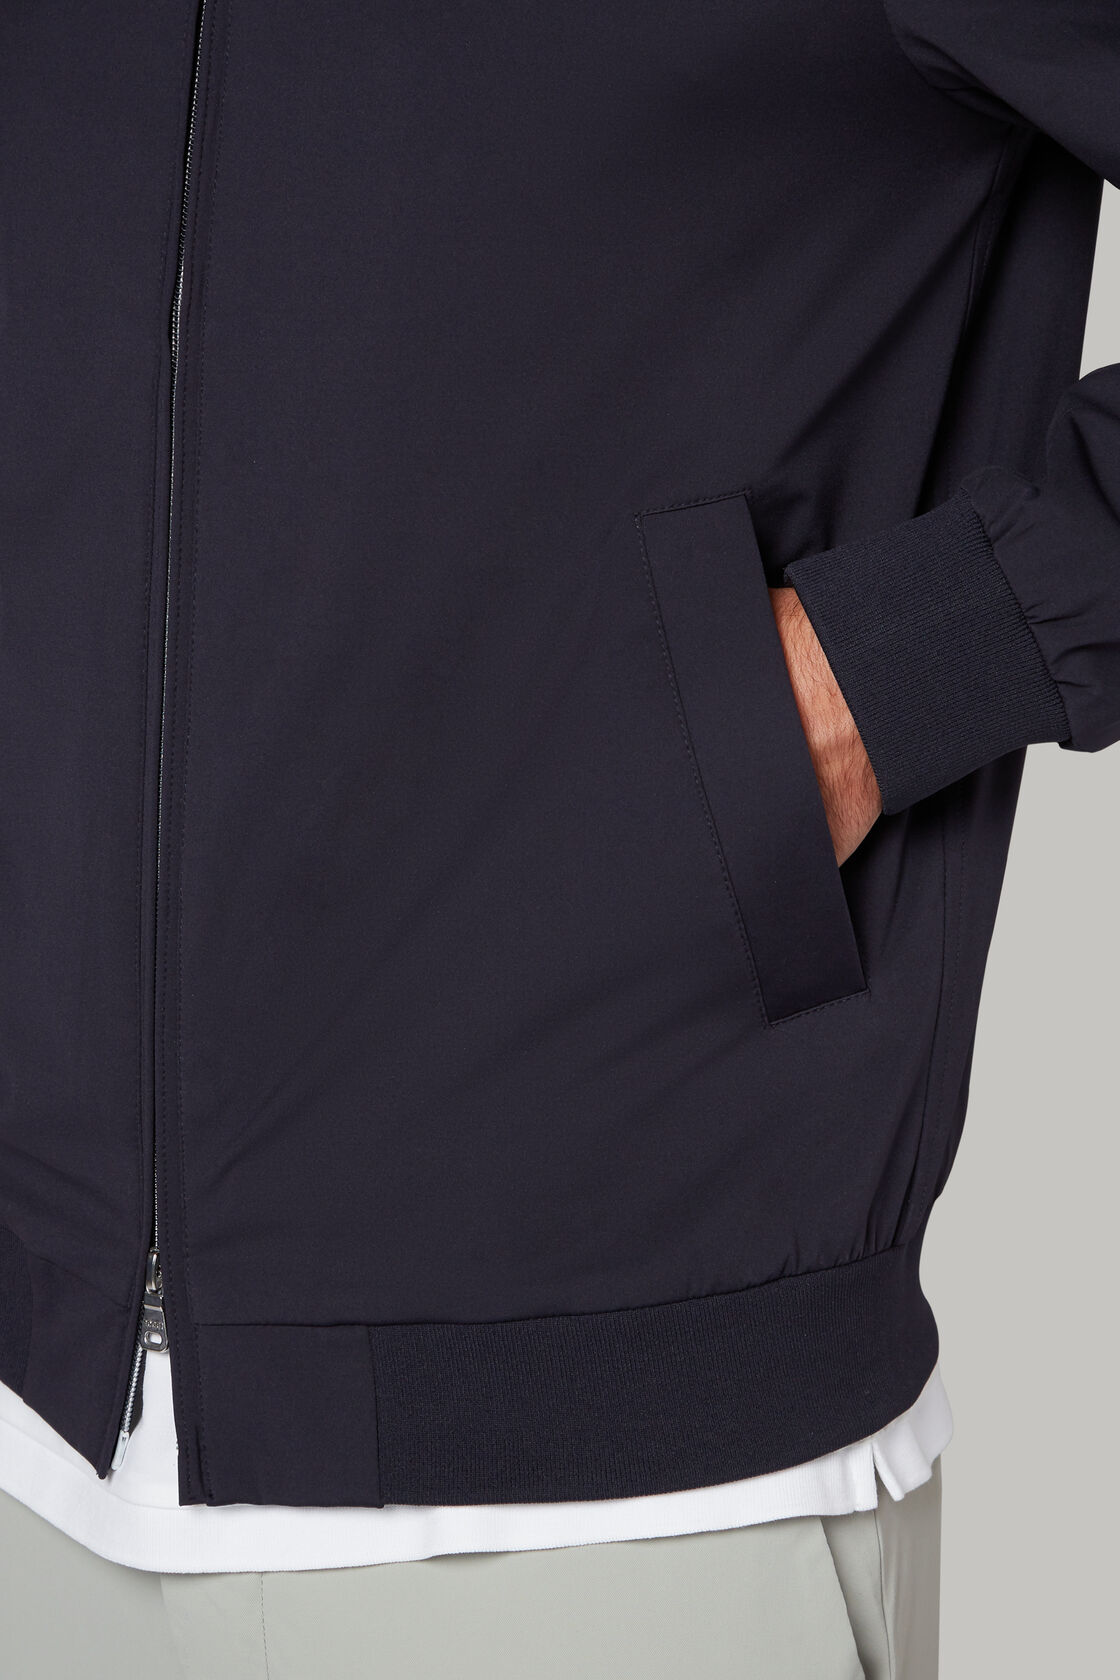 Bomberjacke aus technischem jersey, Navy blau, hi-res